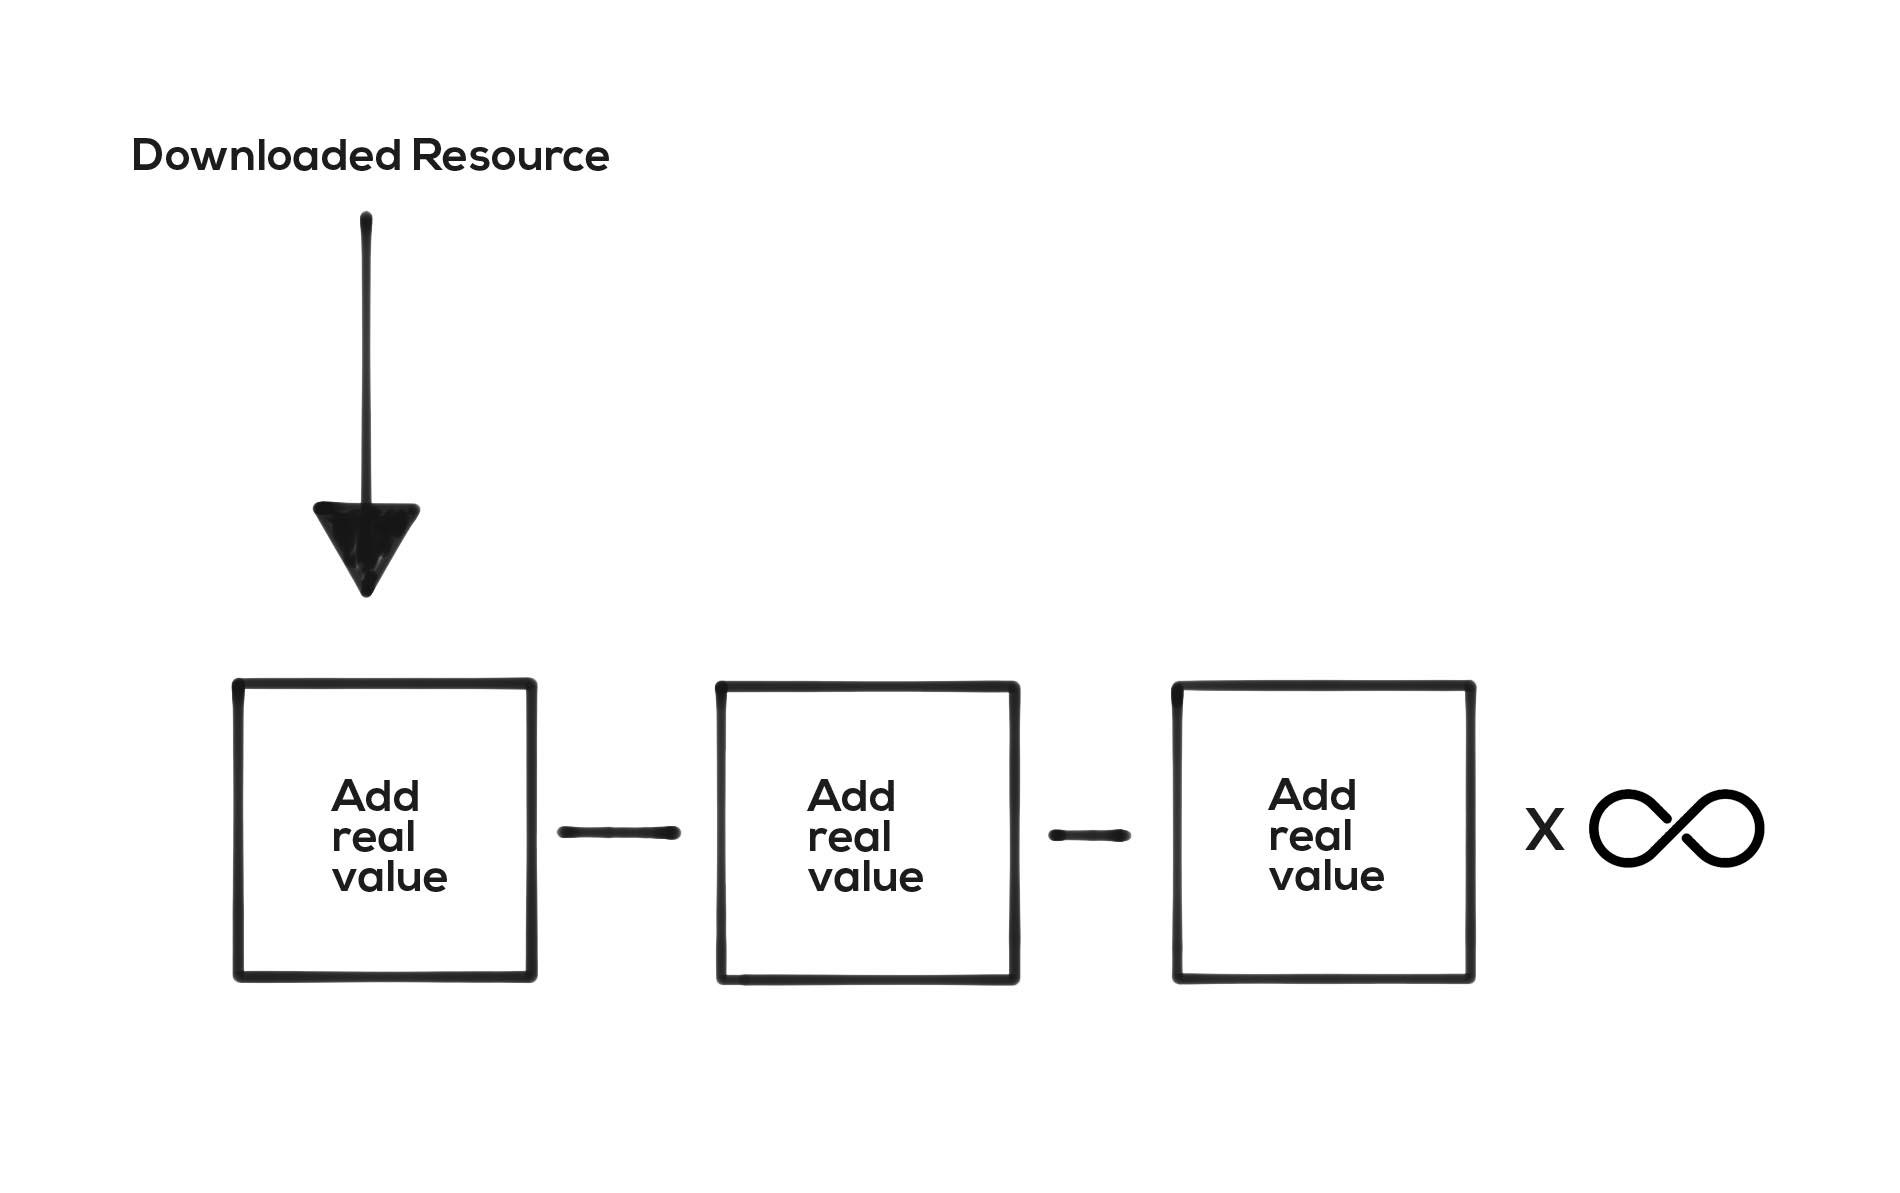 digital_marketing_value_sequence1